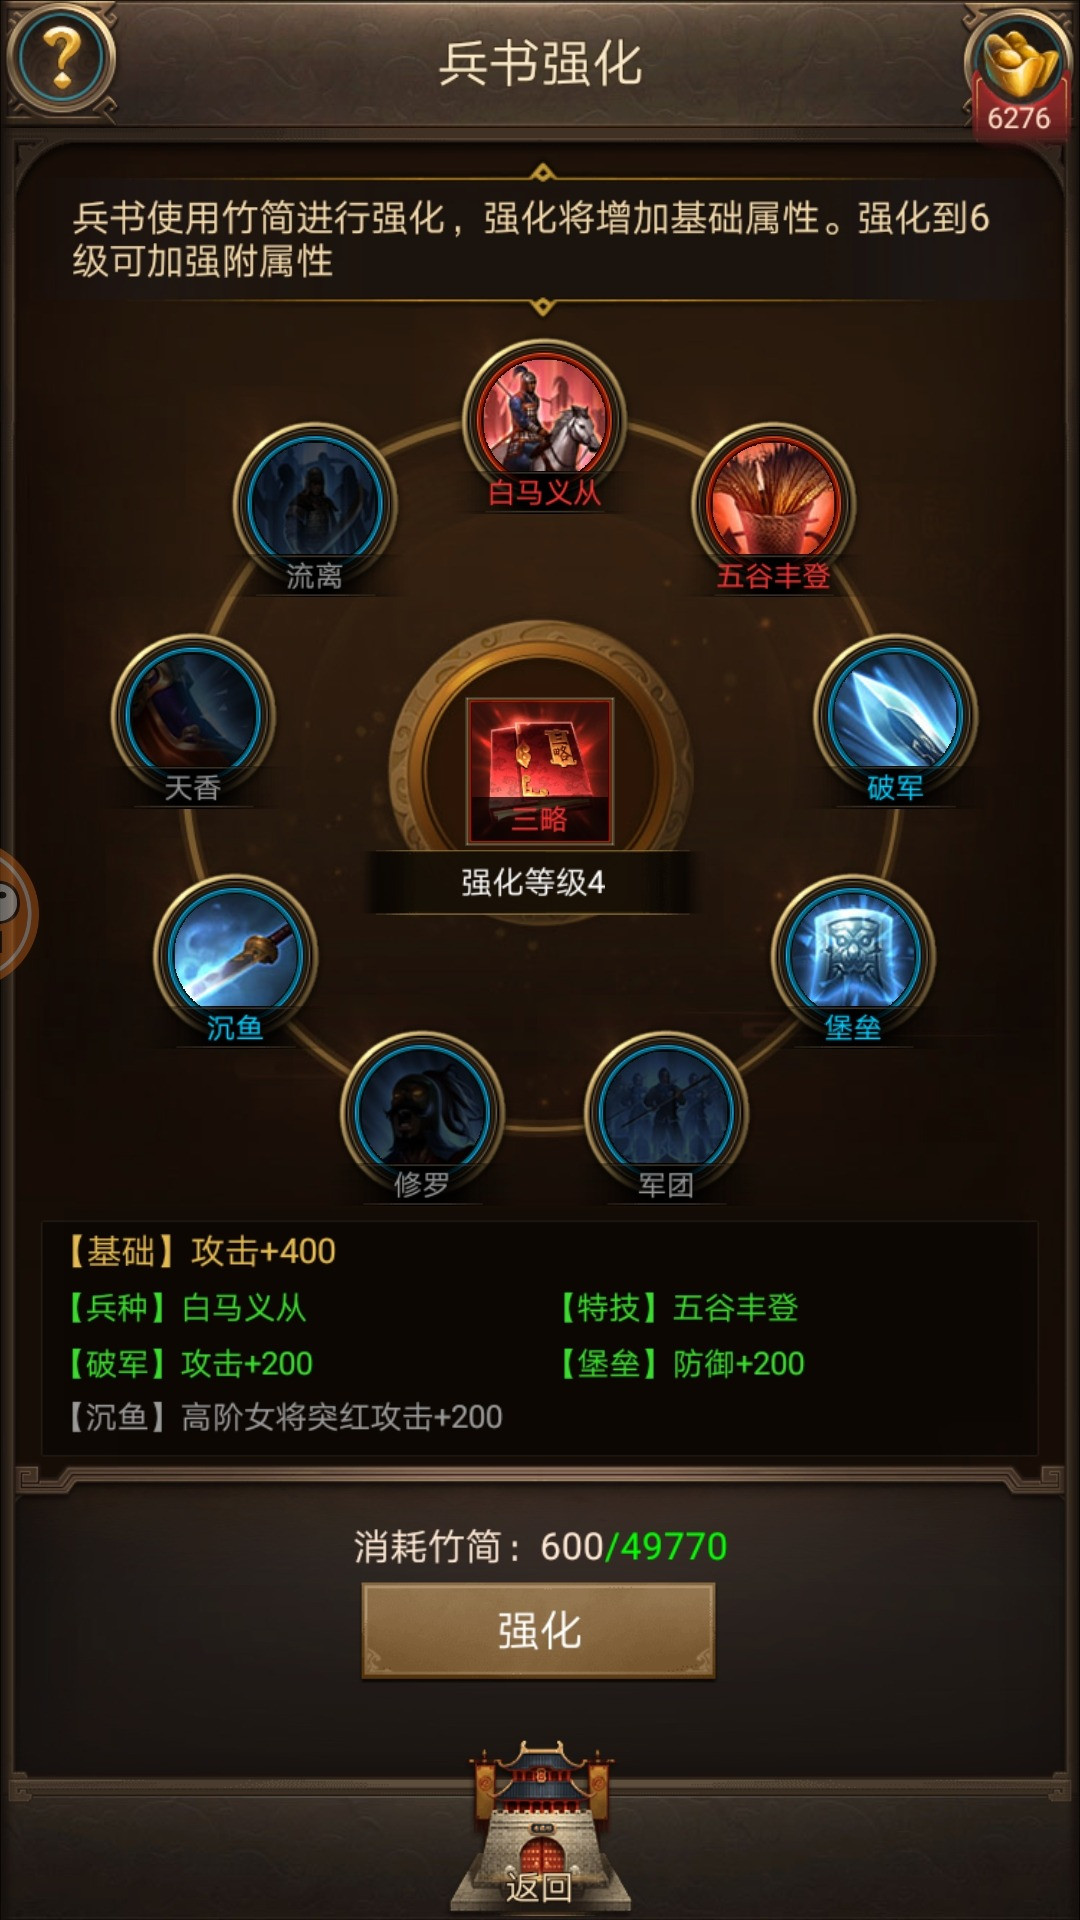 Screenshot_20200310_142945_com.juedigame.sgdjl.shoumeng.jpg